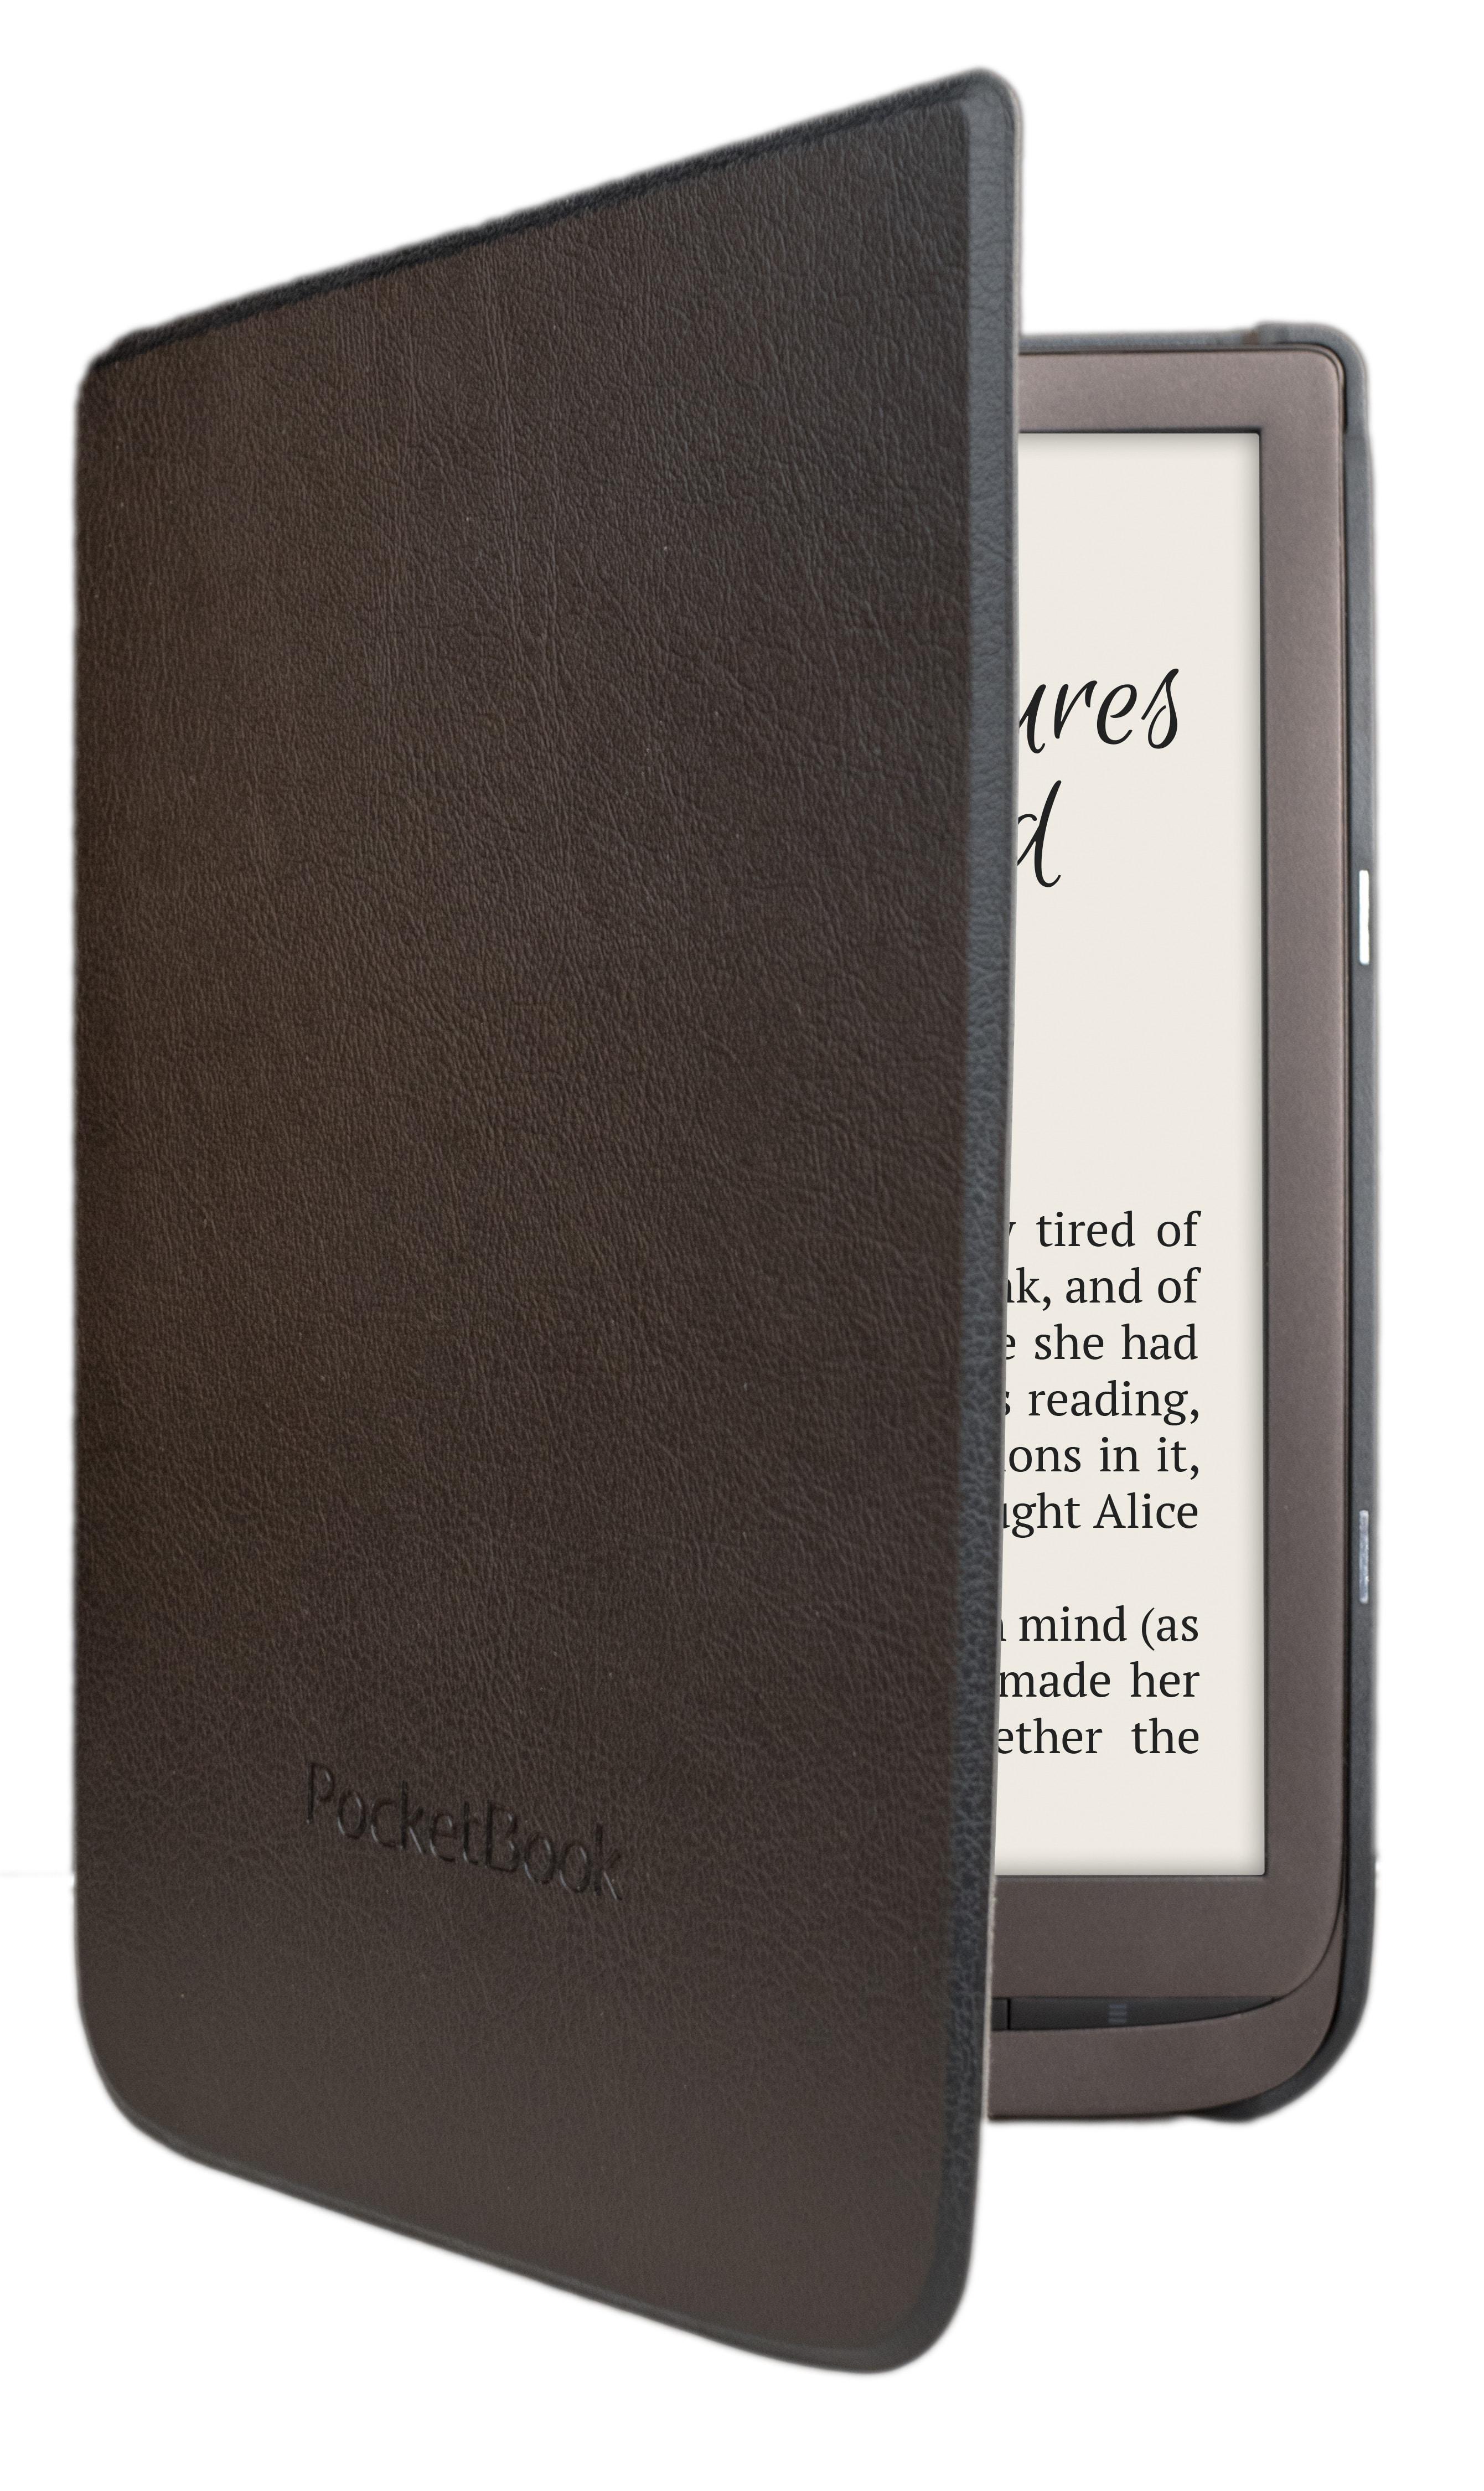 Pocketbook Inkpad 3 Leather Case